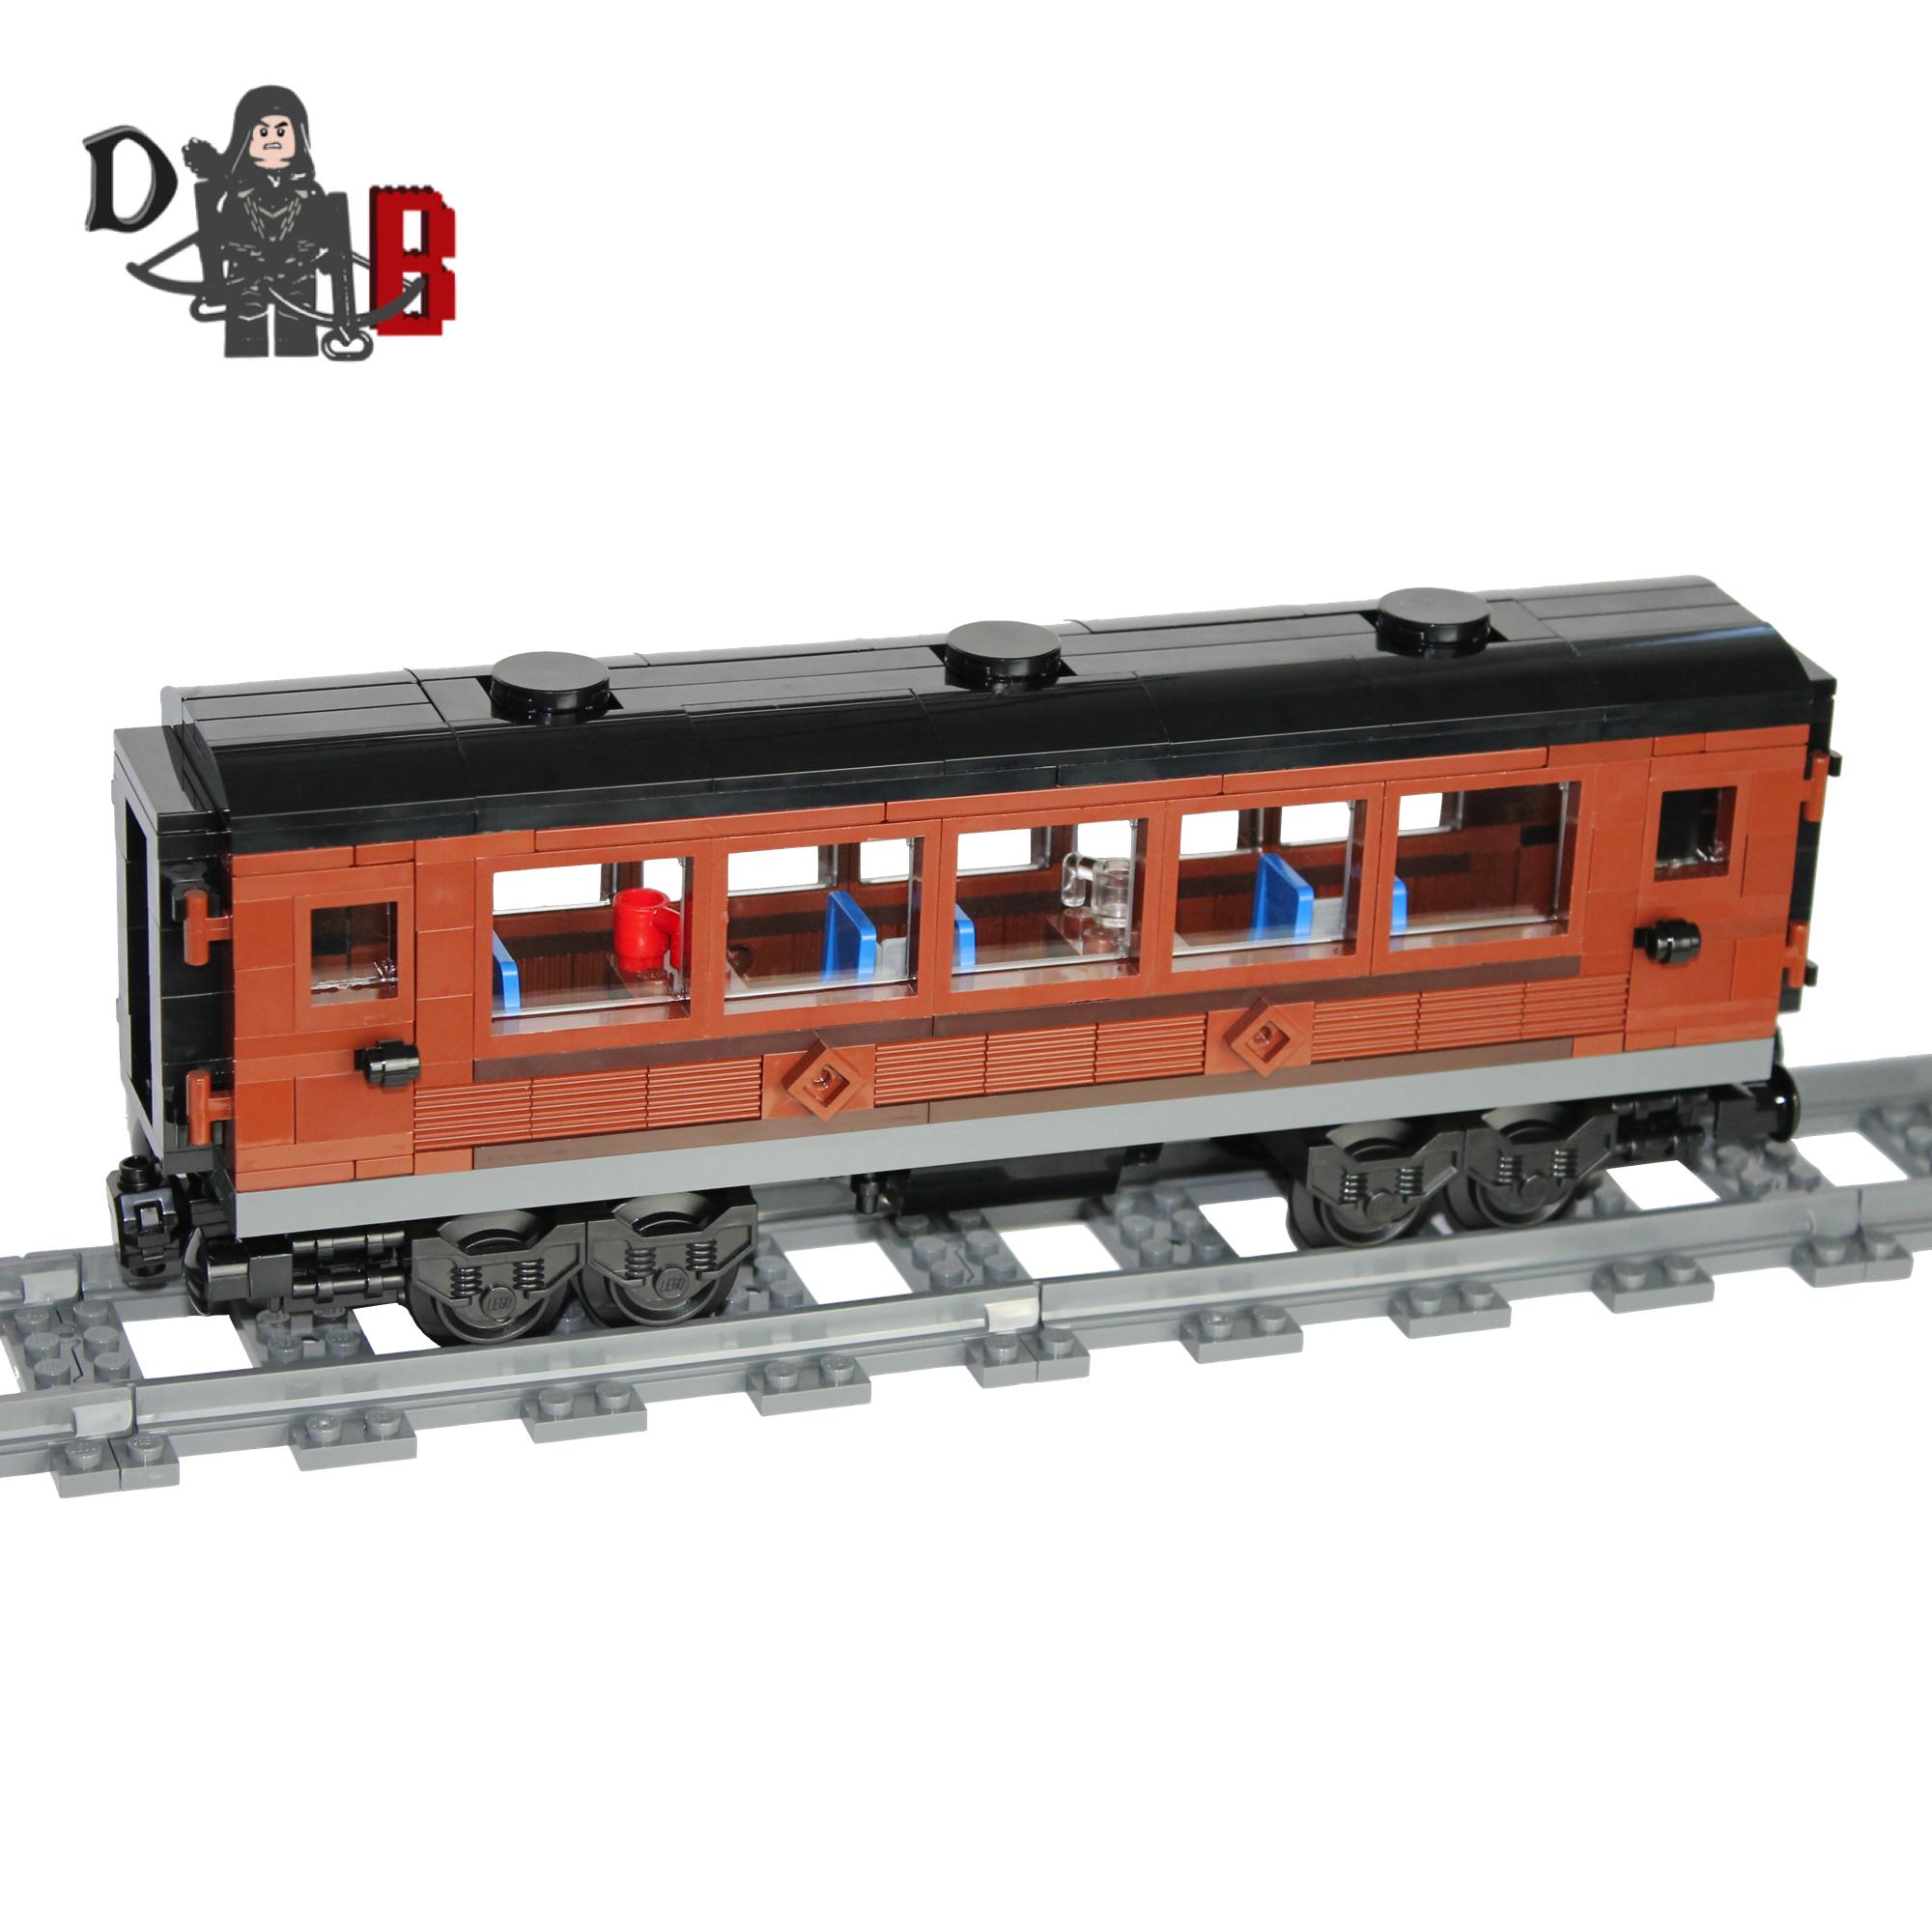 lego Flying scottsman passenger carriage main